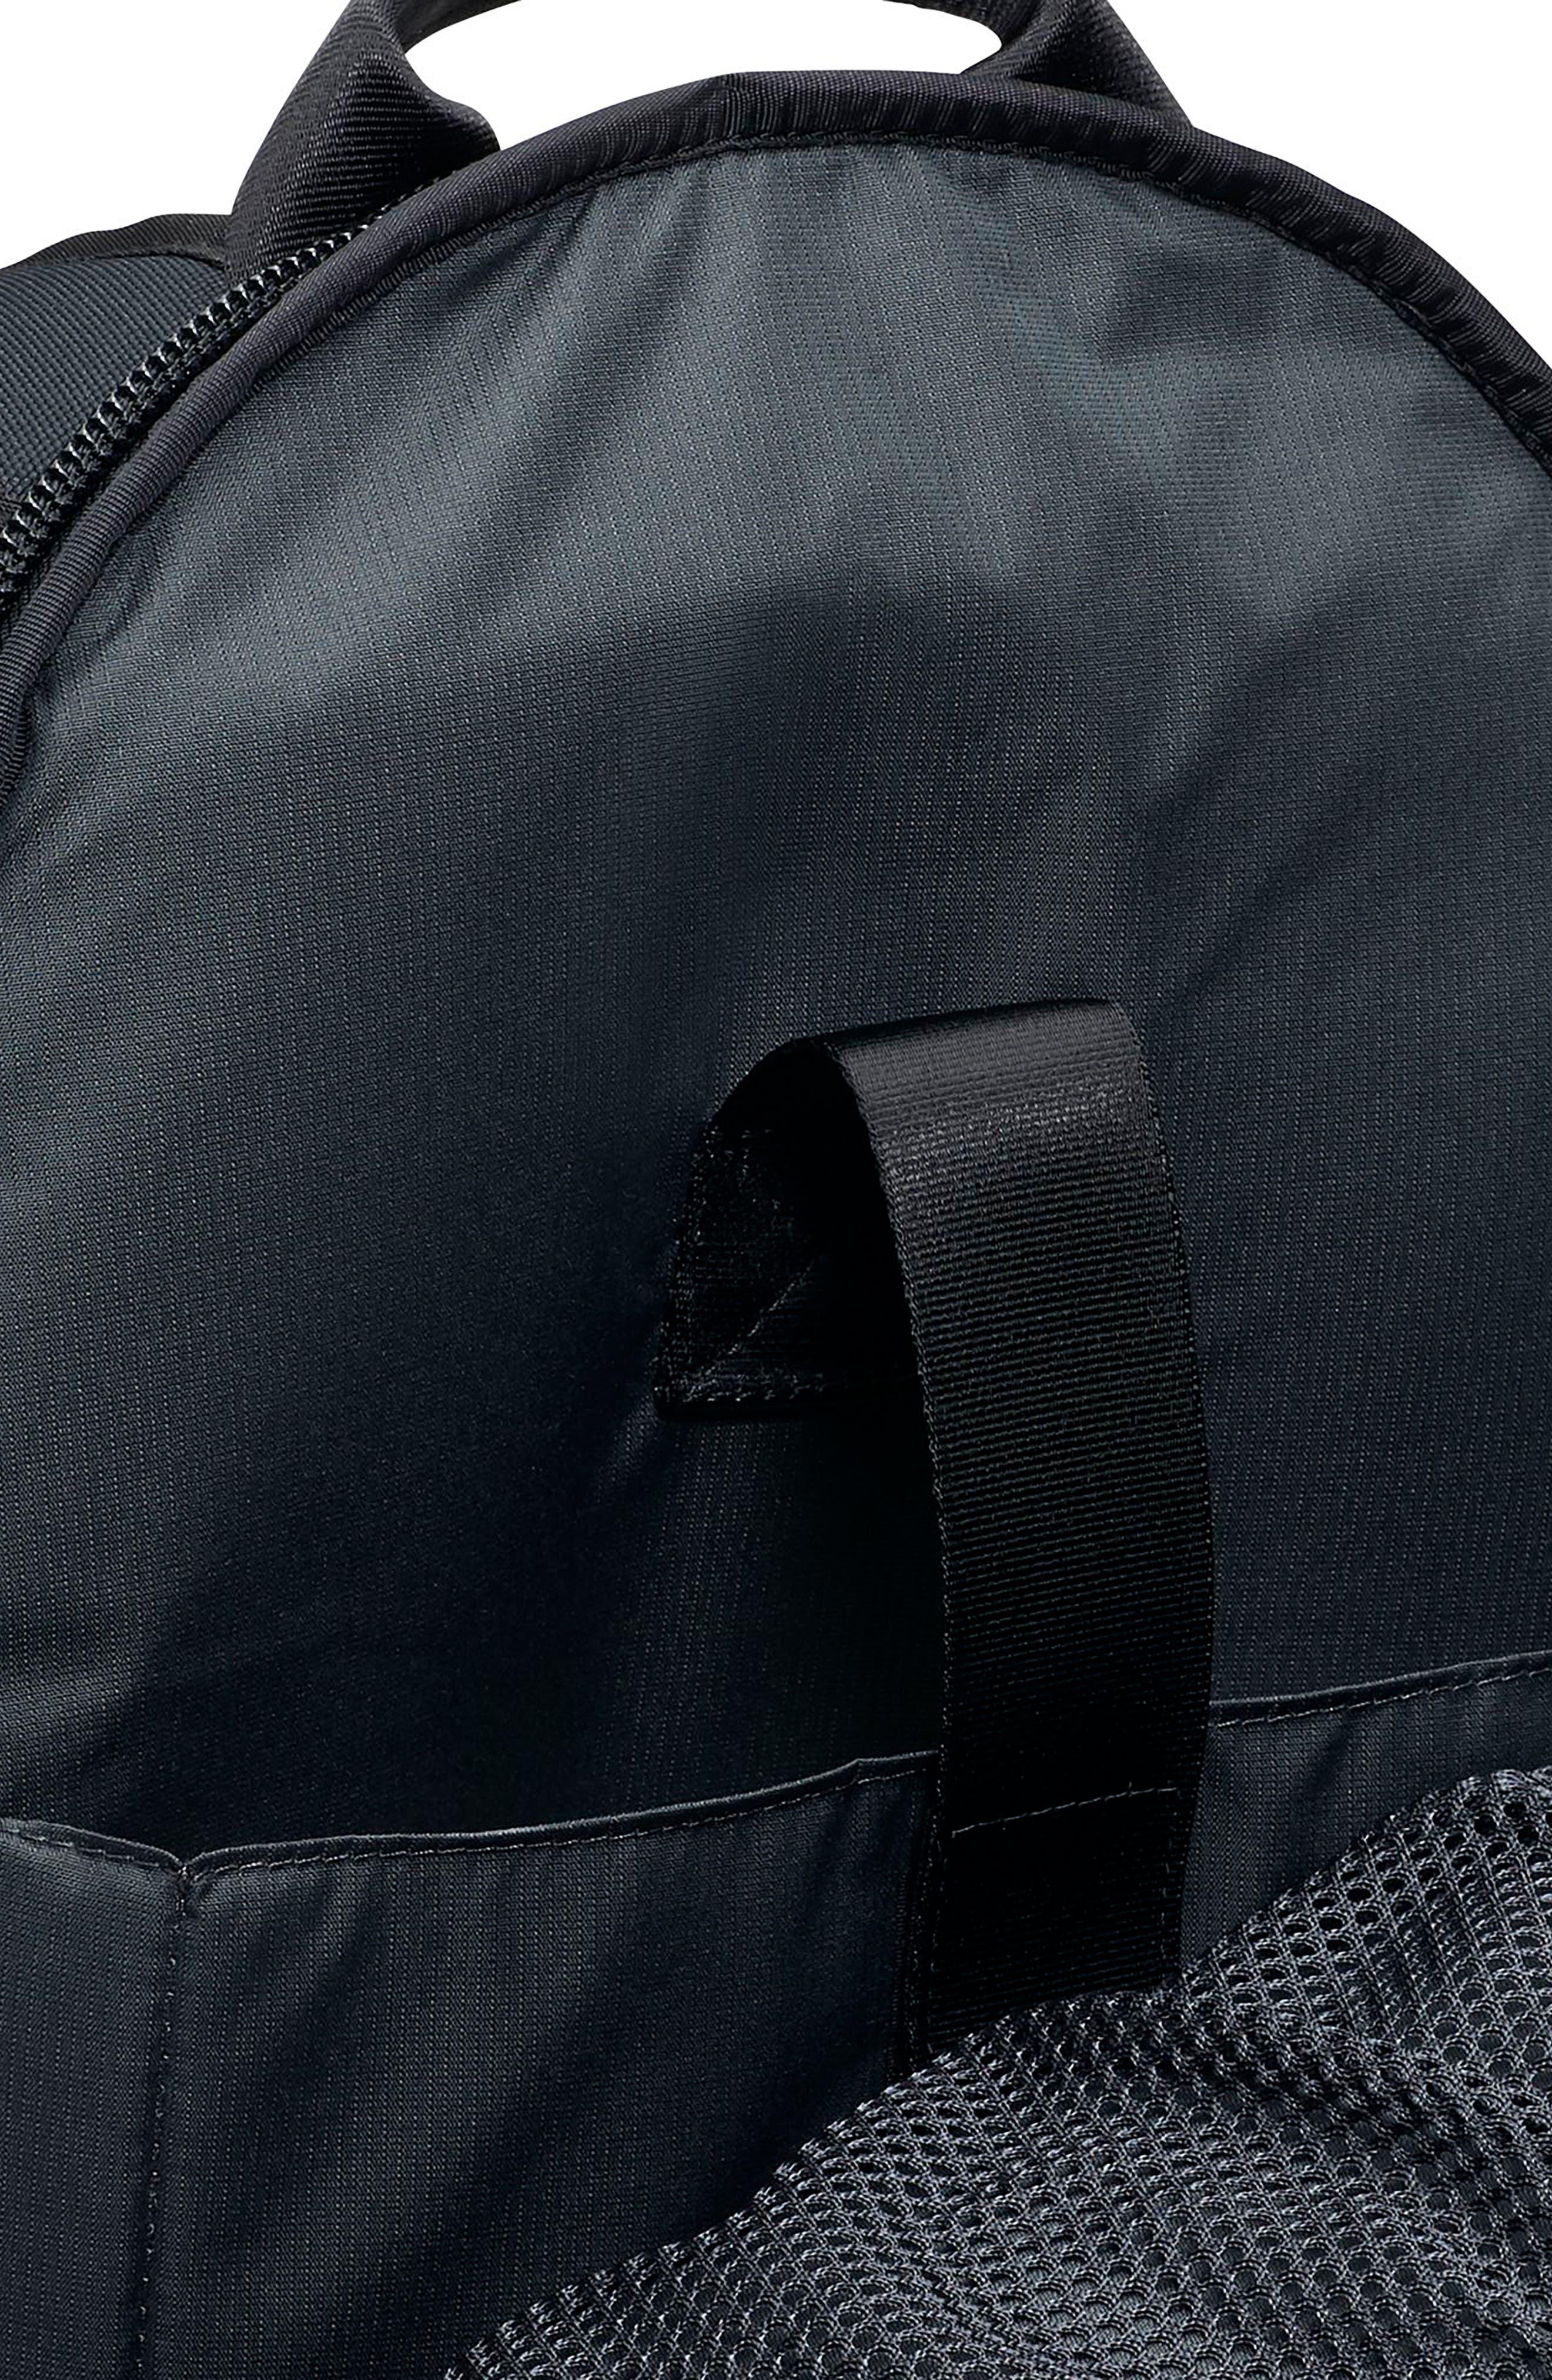 NikeLab Laptop Backpack,                             Alternate thumbnail 6, color,                             010